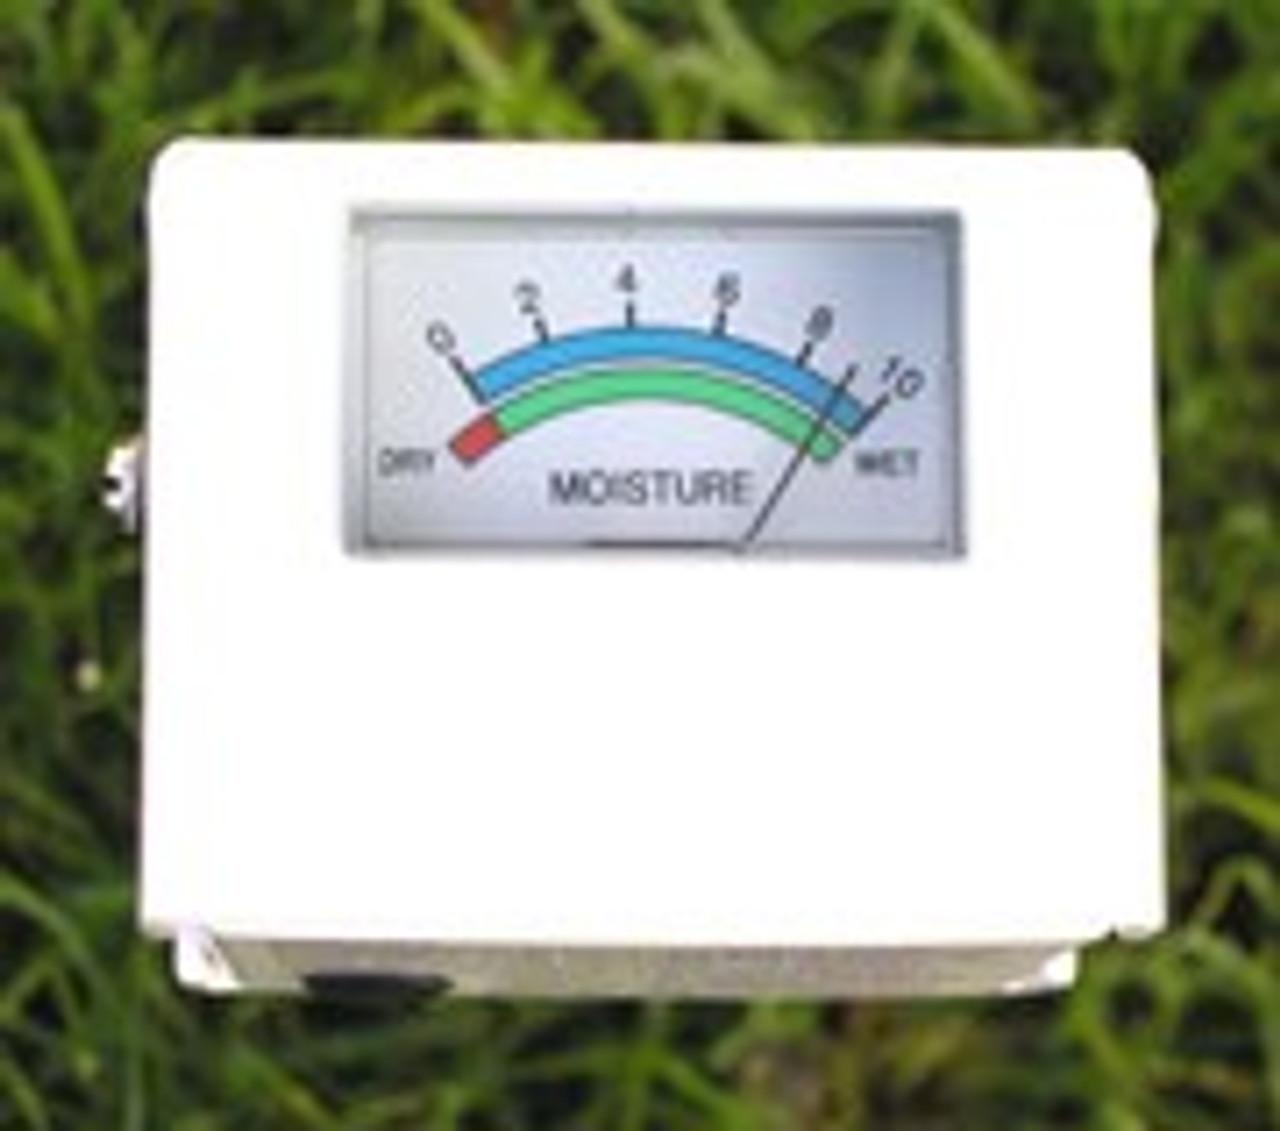 Reotemp Compost Moisture Meter